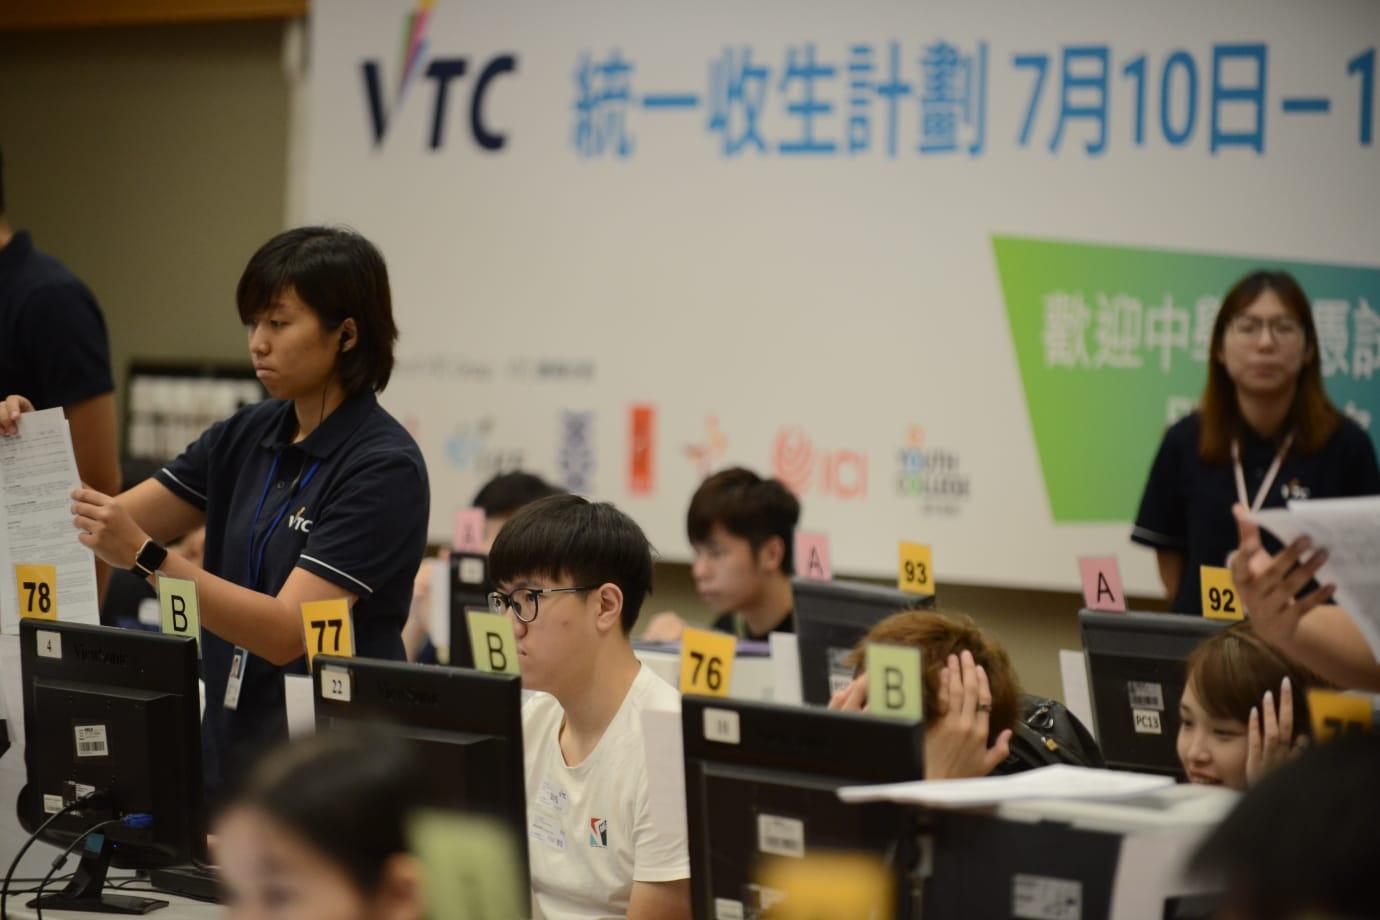 VTC聯合招生中心黃克競分校